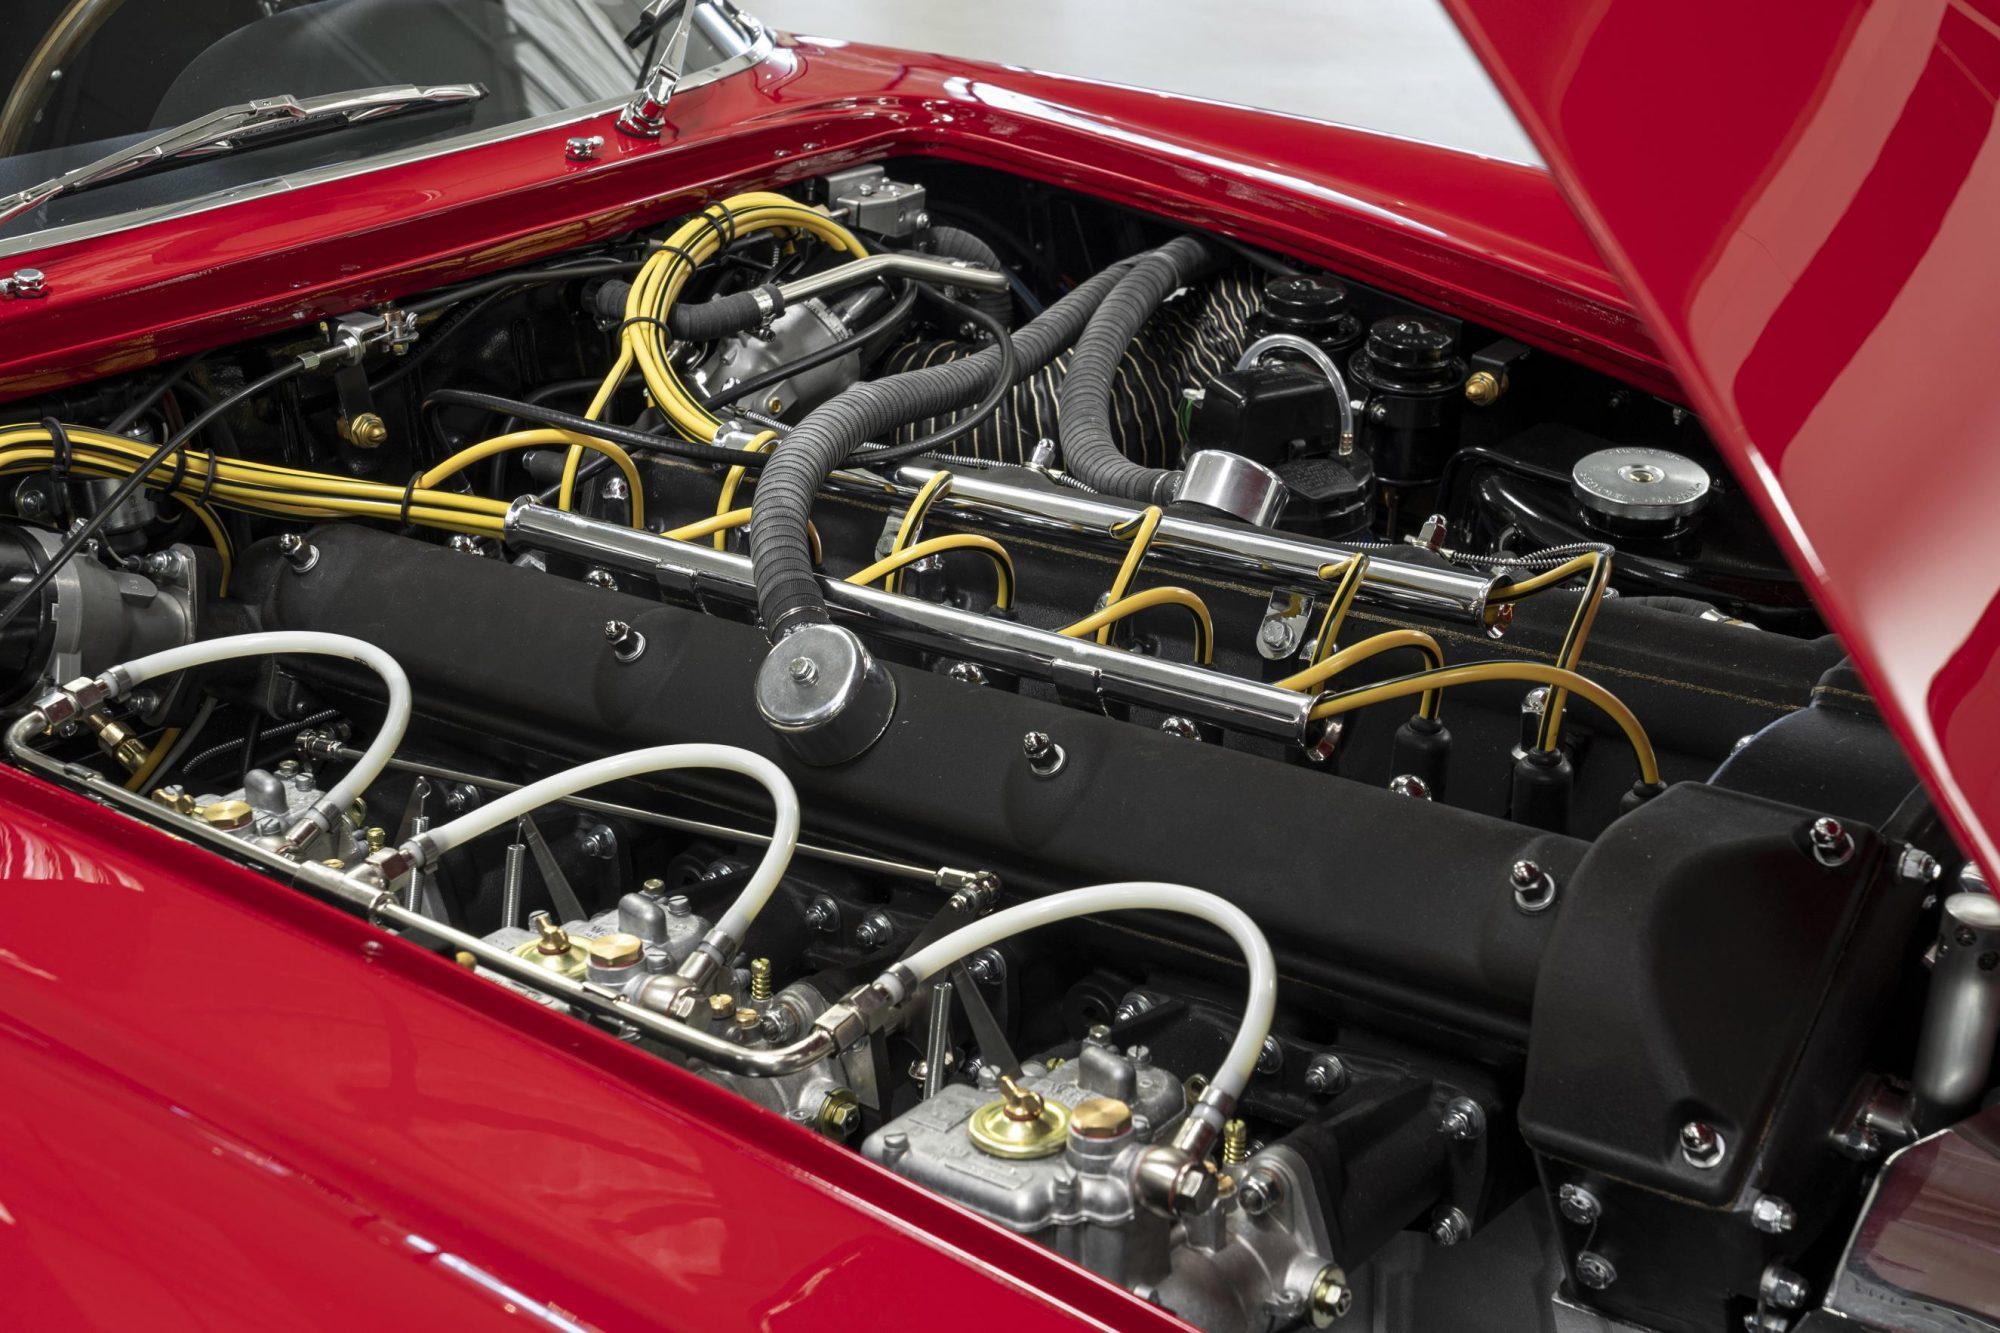 Aston Martin, Aston martin DB4 Zagato, DB4, Zagato, Zagato Continuation, DB4 engine